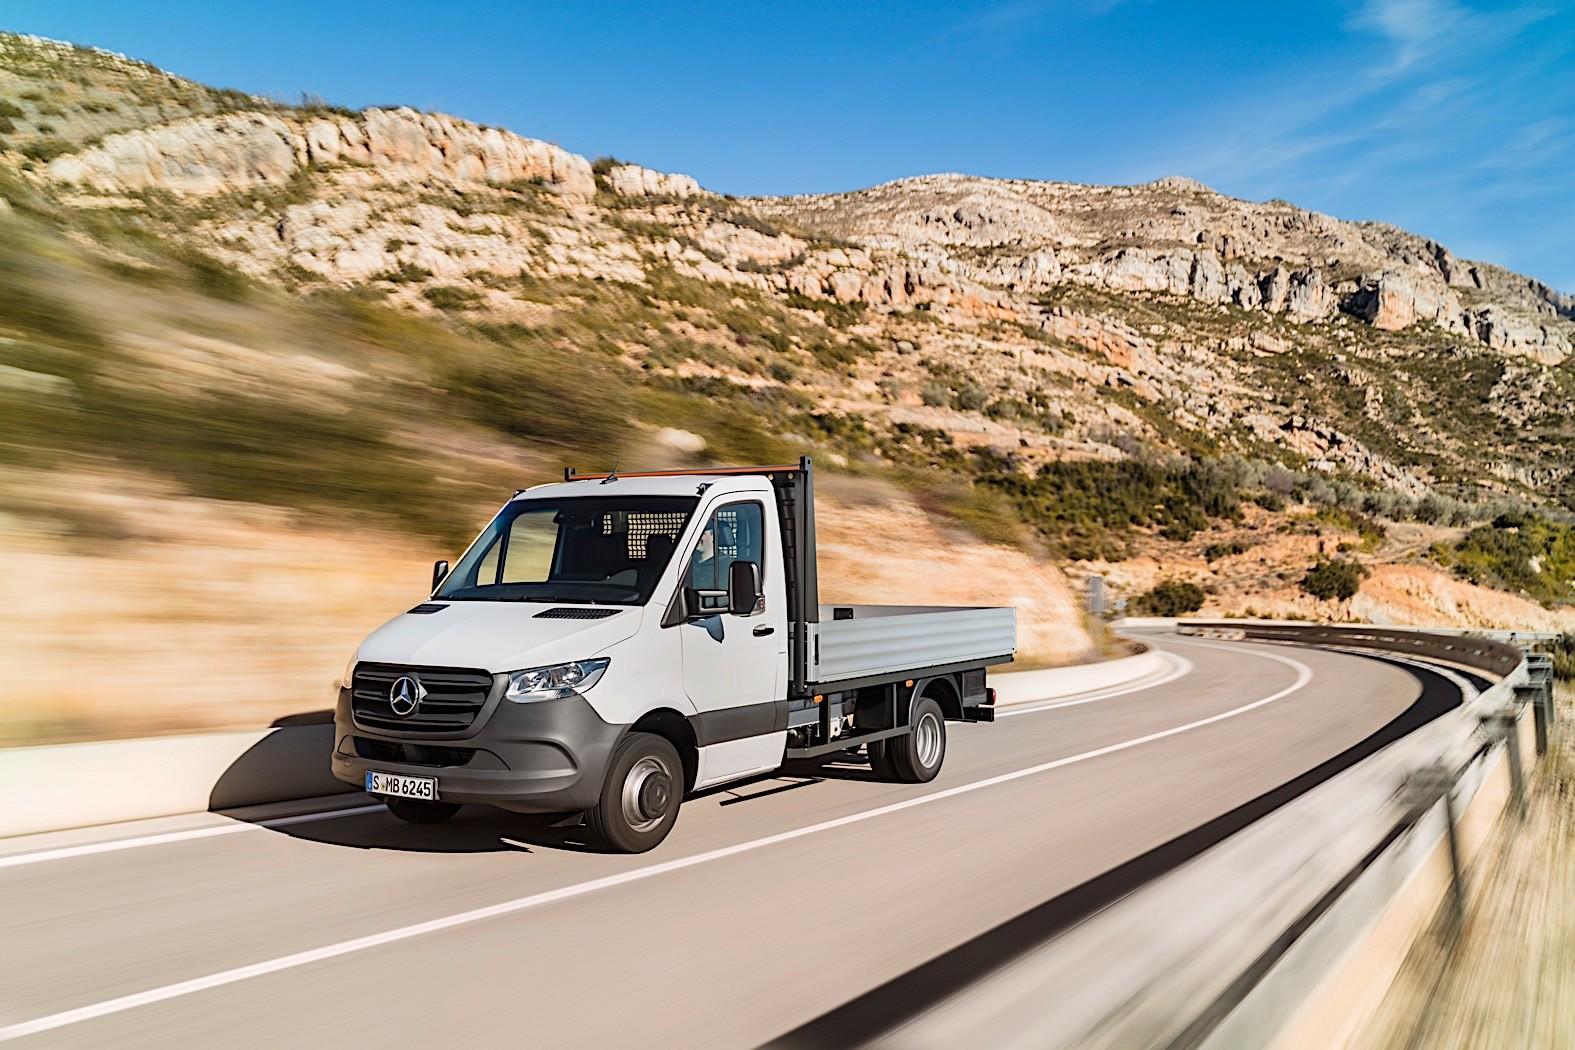 Mercedes-Benz Sprinter-based RV Reviewed by AutoBlog - autoevolution